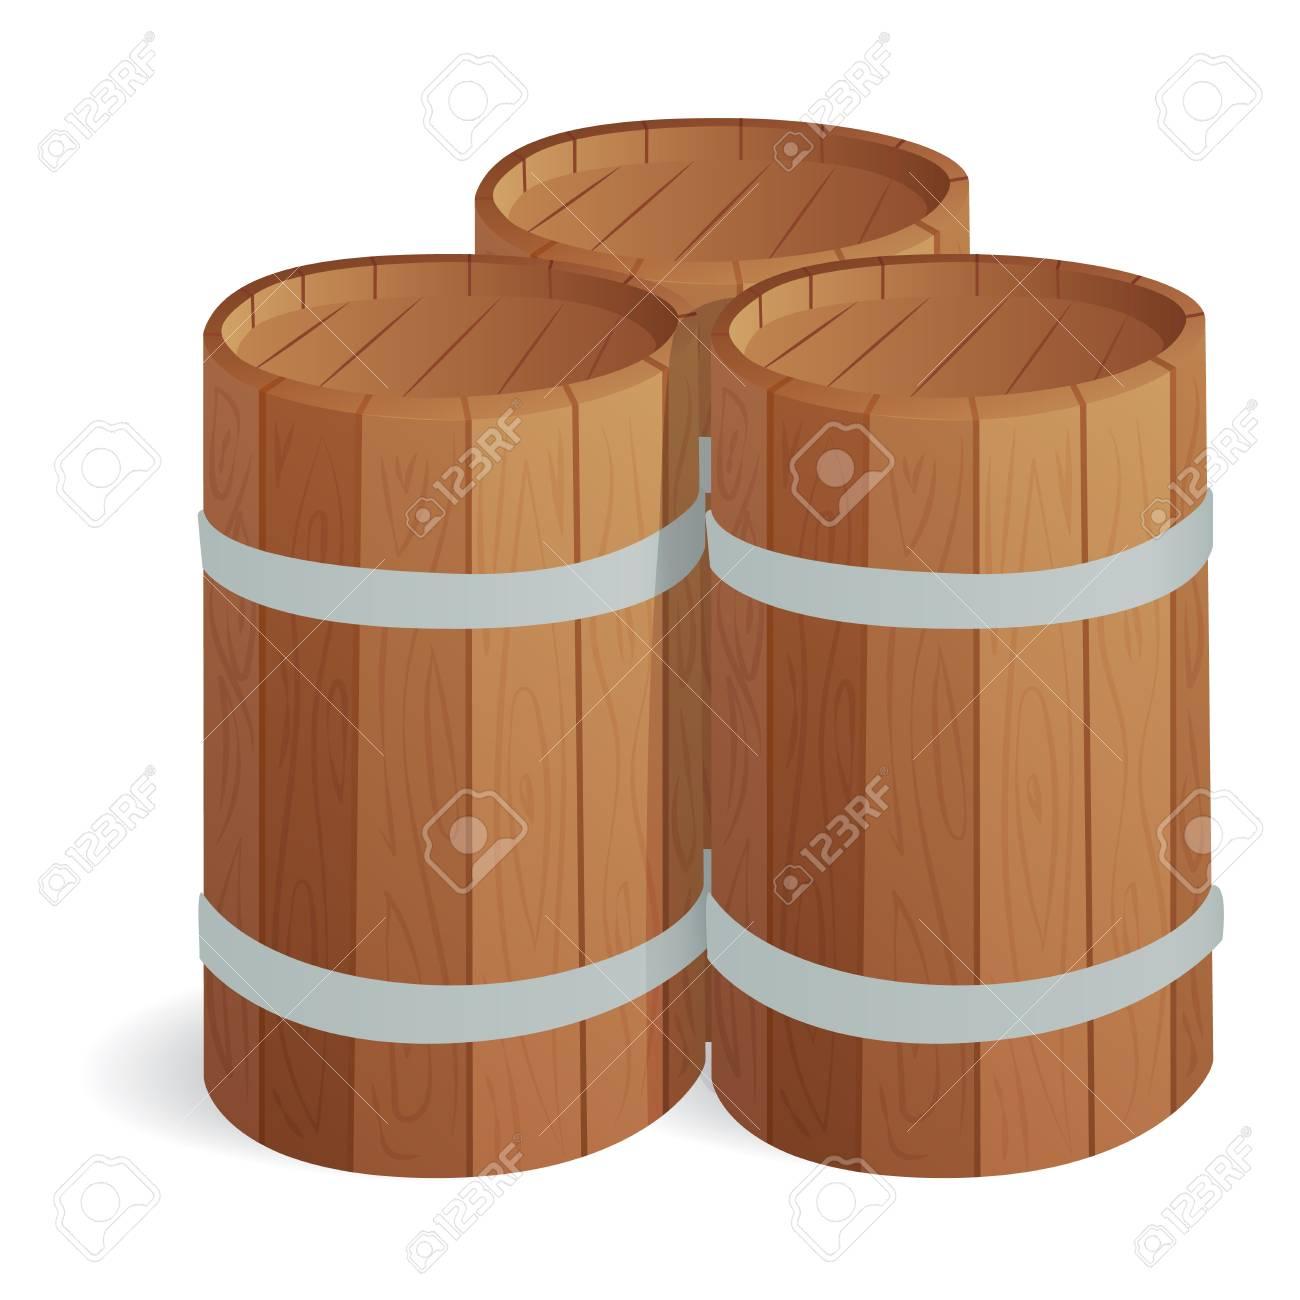 storage oak wine barrels. Vector - Wooden Barrel Vintage Old Style Barrels Oak Storage Container. Wine E